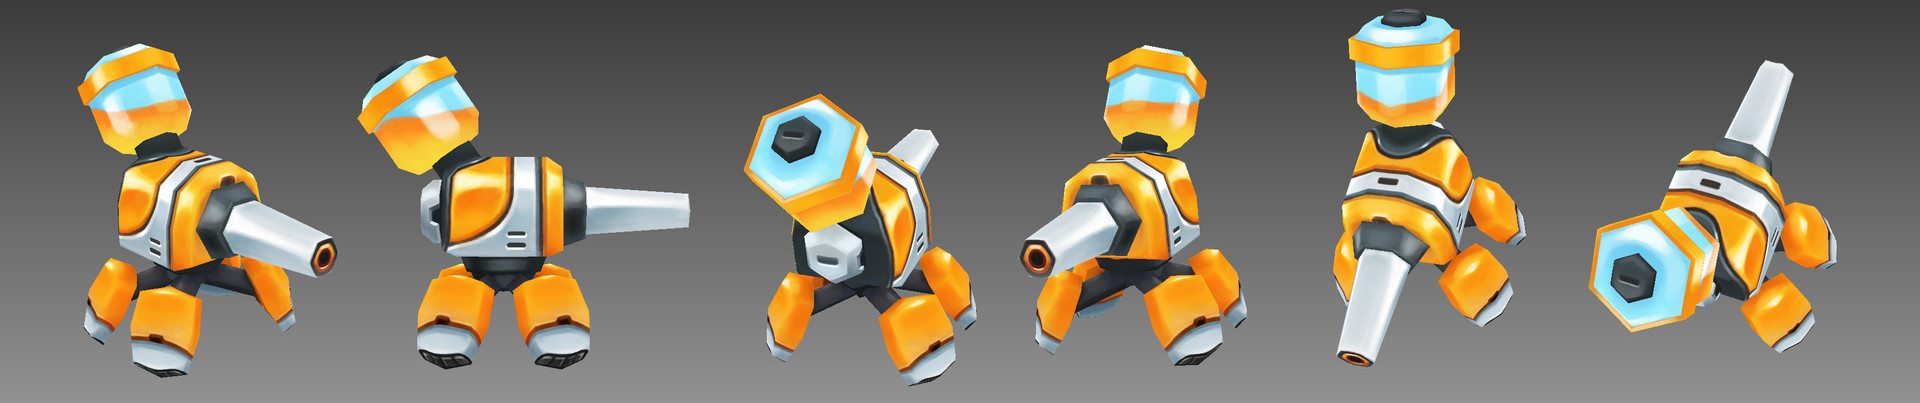 Jose cua droid canister var2 1